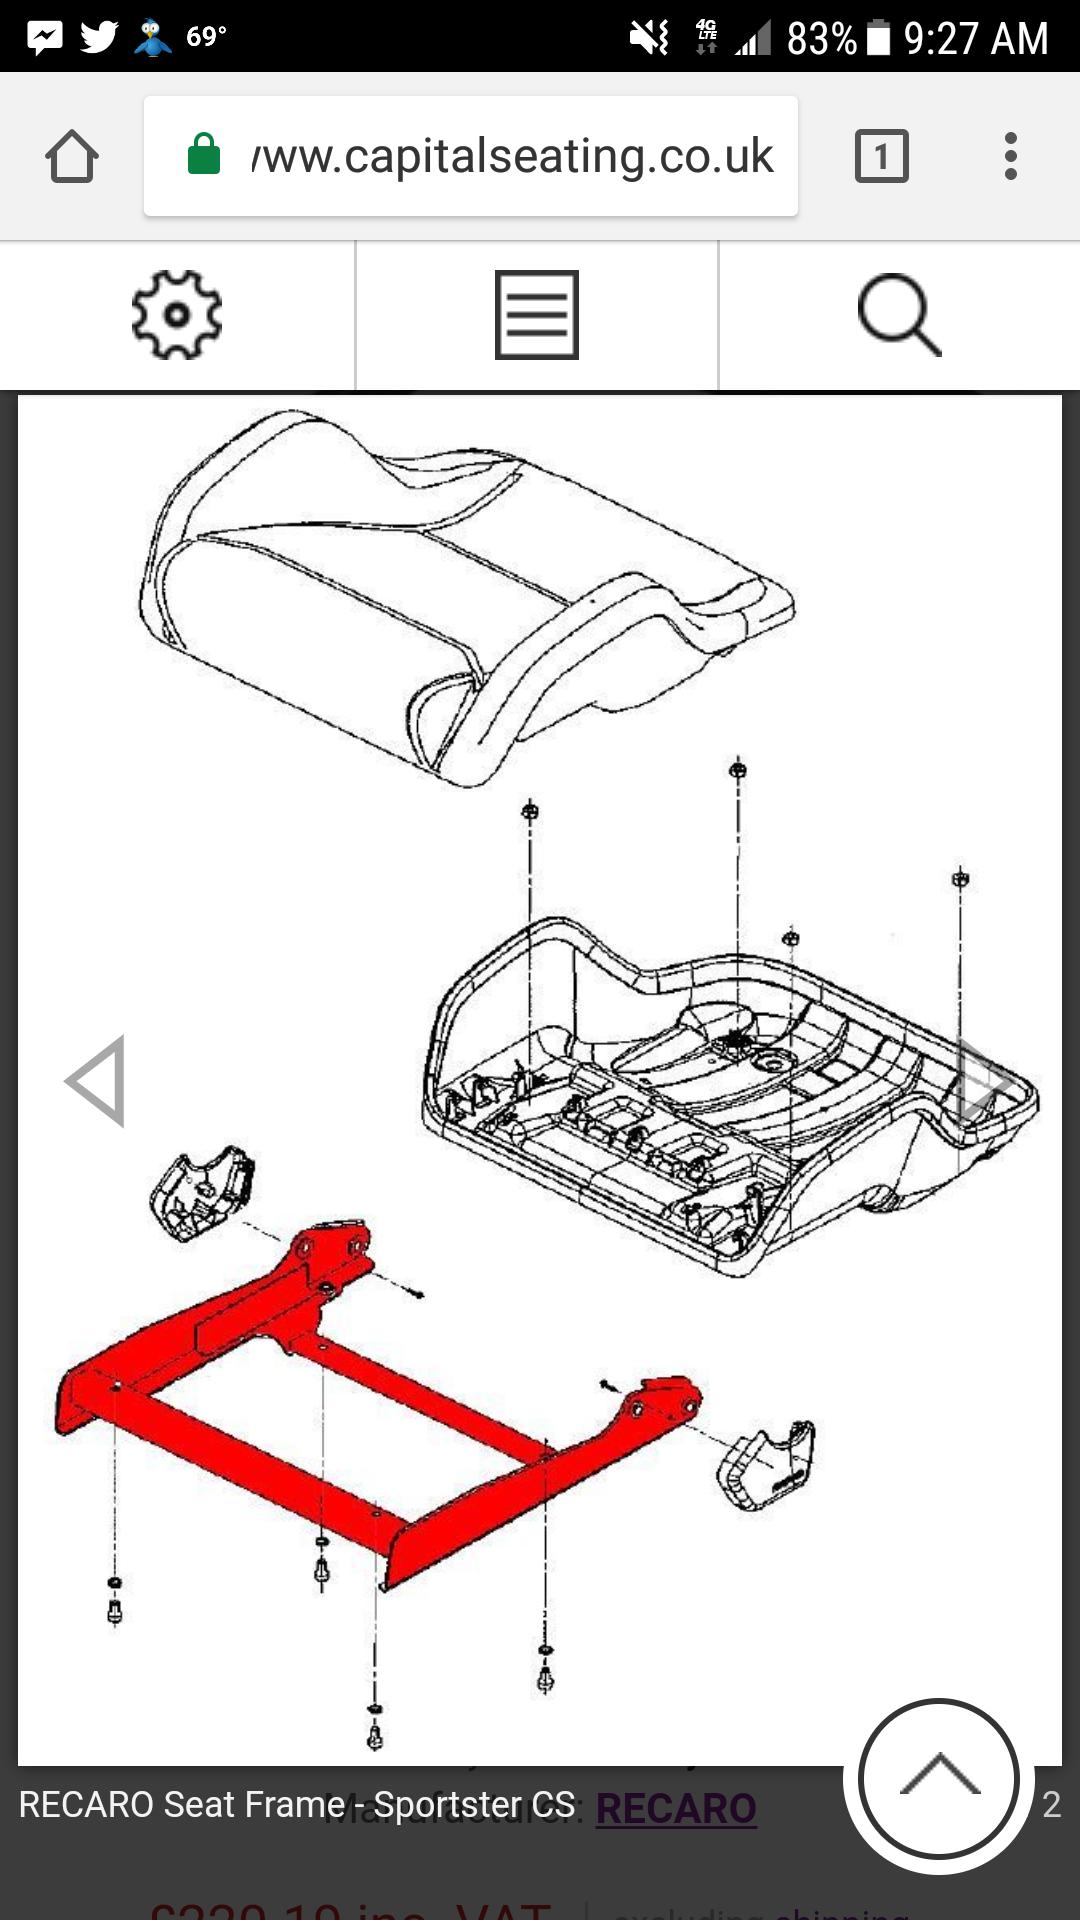 Recaro sportster bottom seat frame - S2KI Honda S2000 Forums